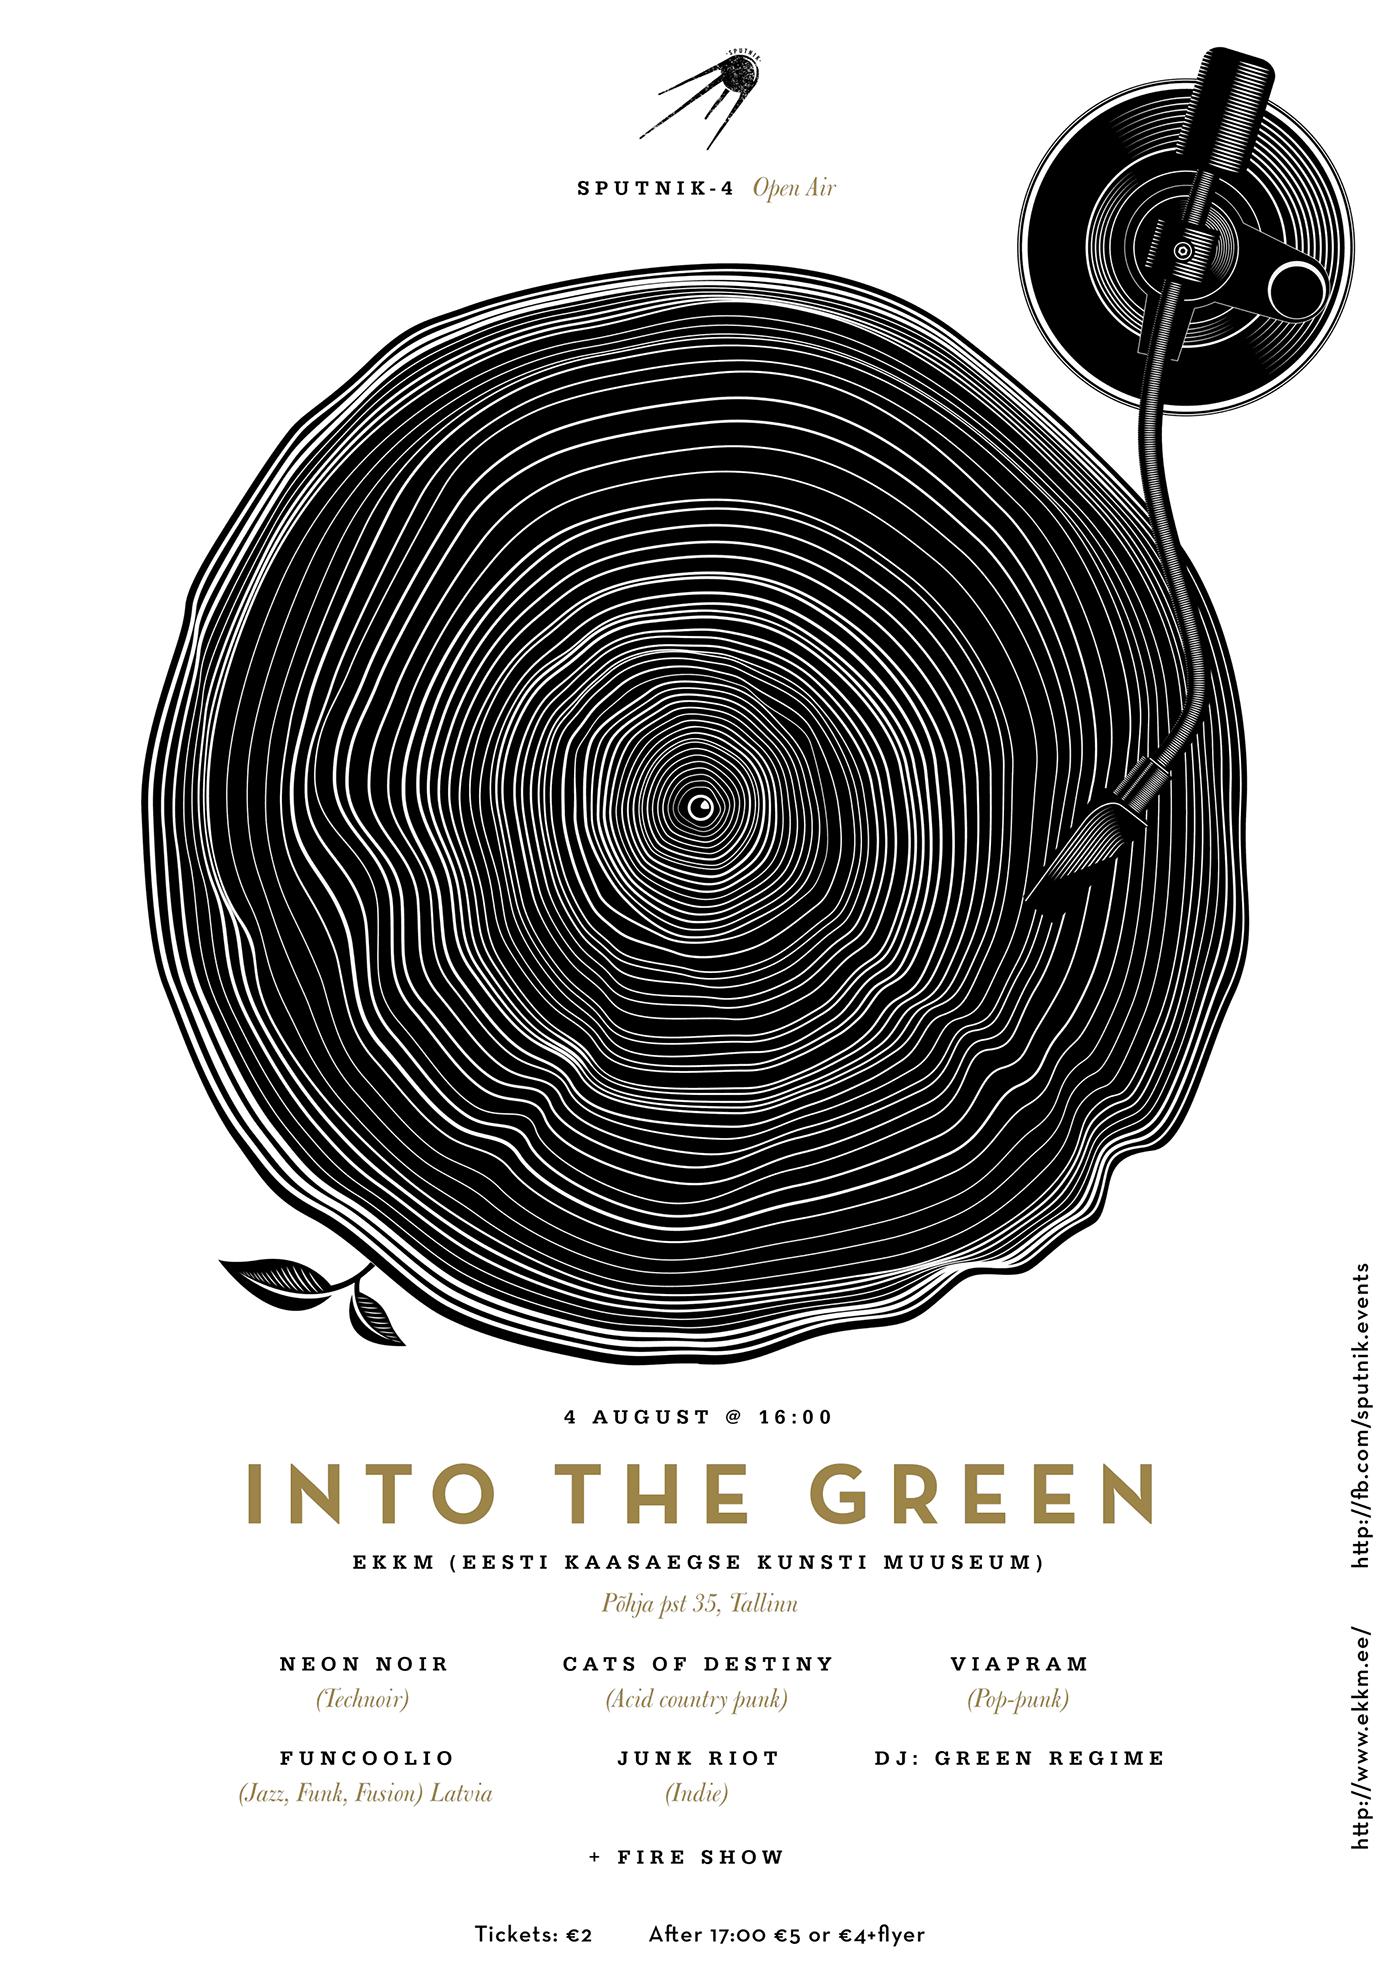 into the green Sputnik open air Event poster print vinyl stump player anton burmistrov Graphic Designer Estonia Tallinn turntable